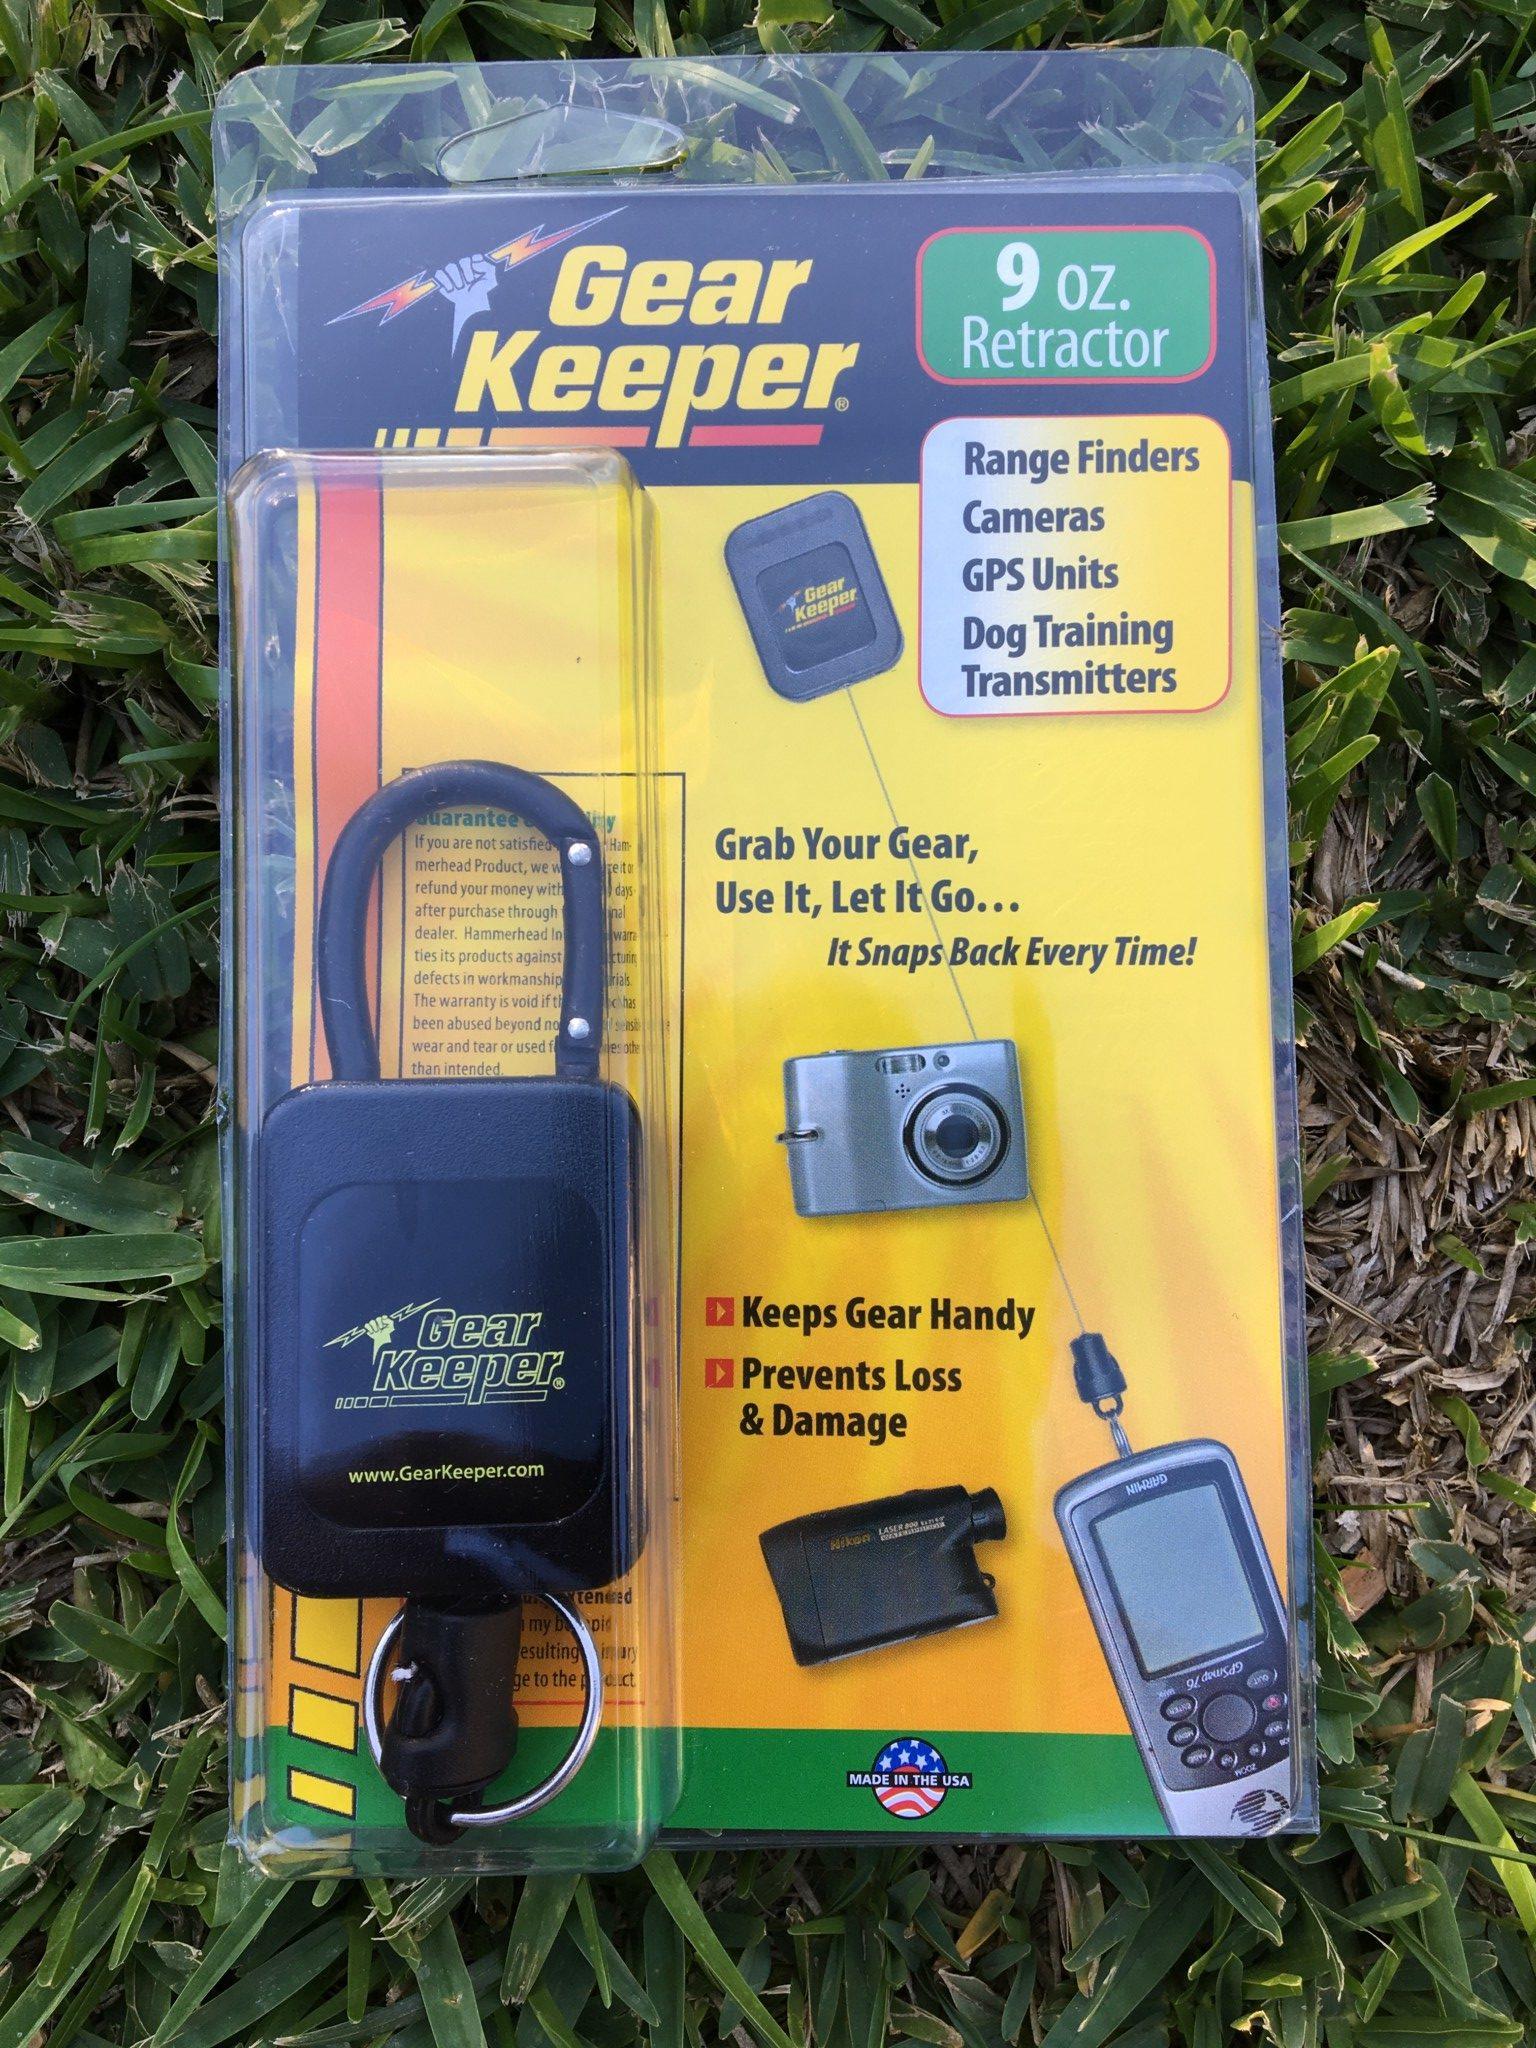 Gear Keeper Retractor